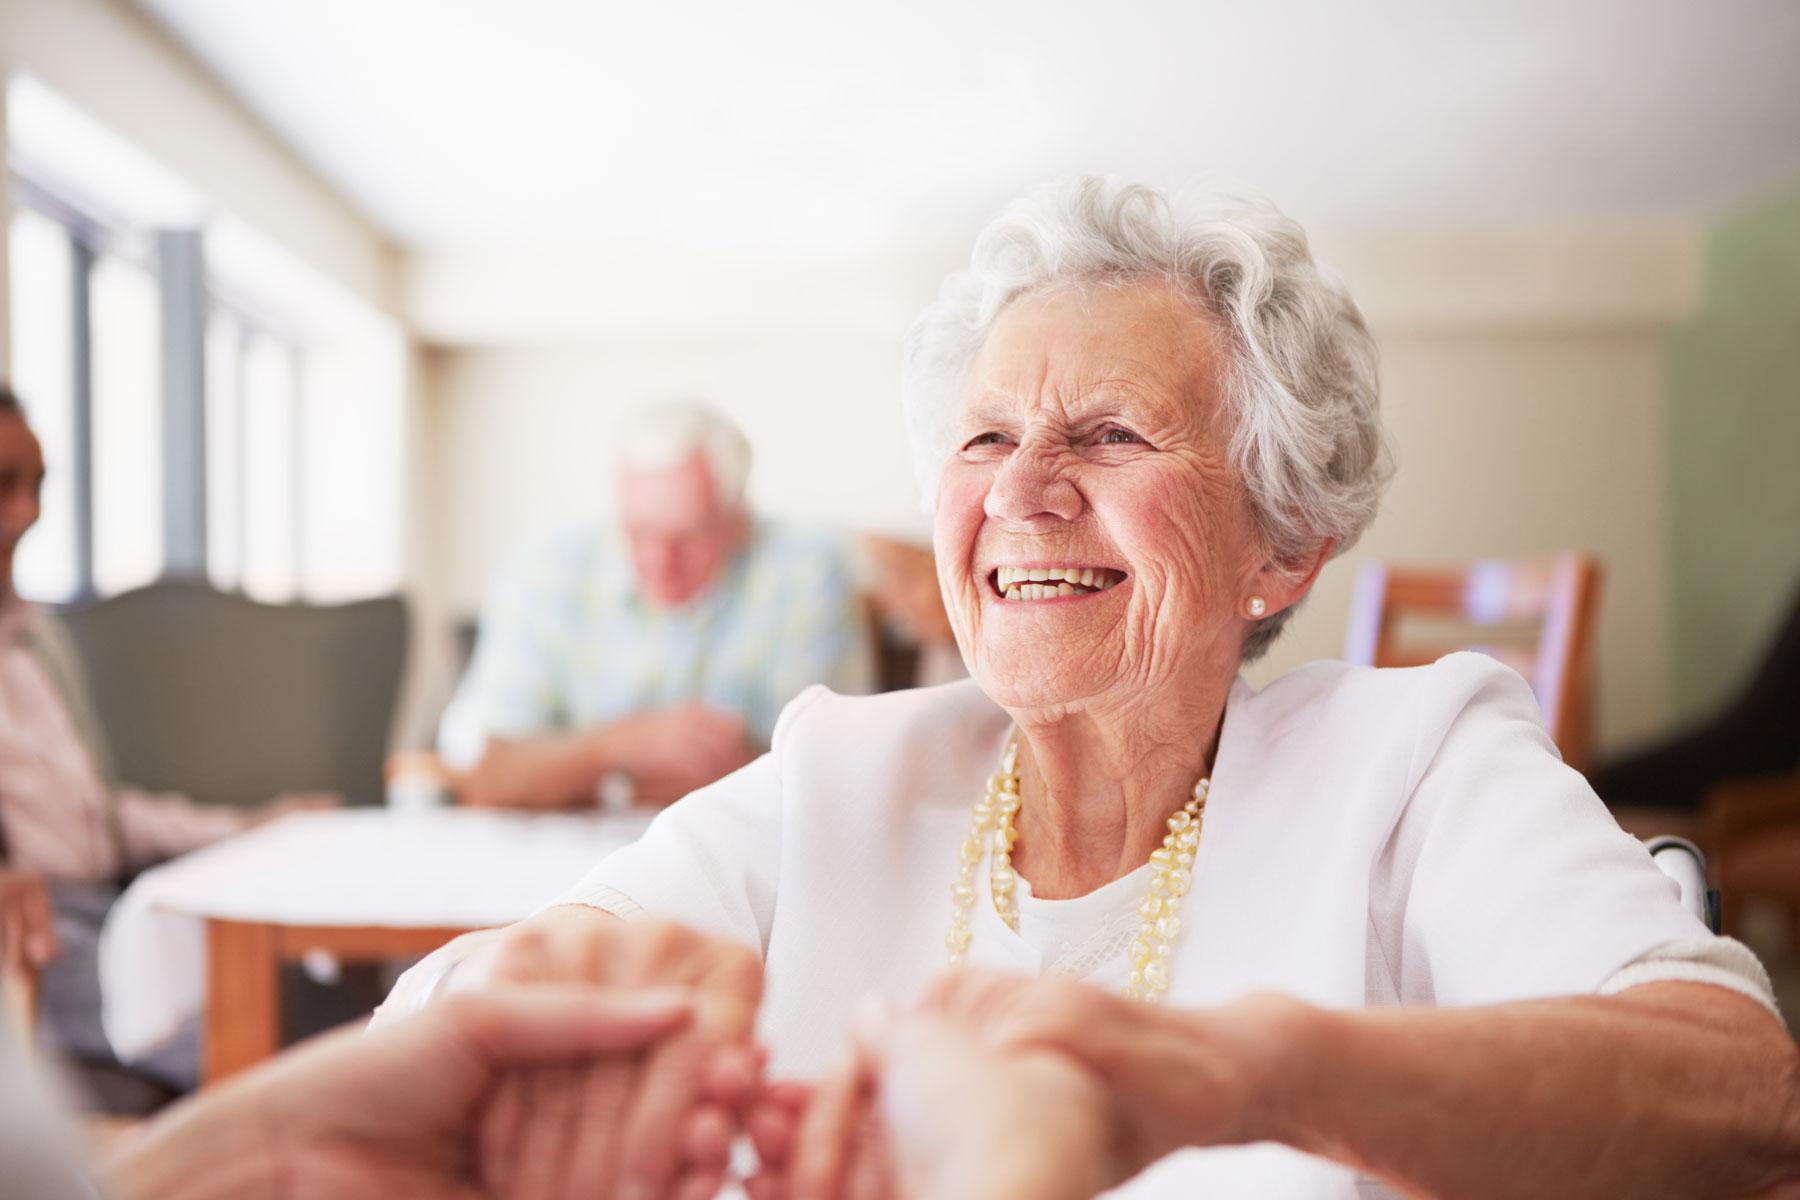 Elderly woman grinning